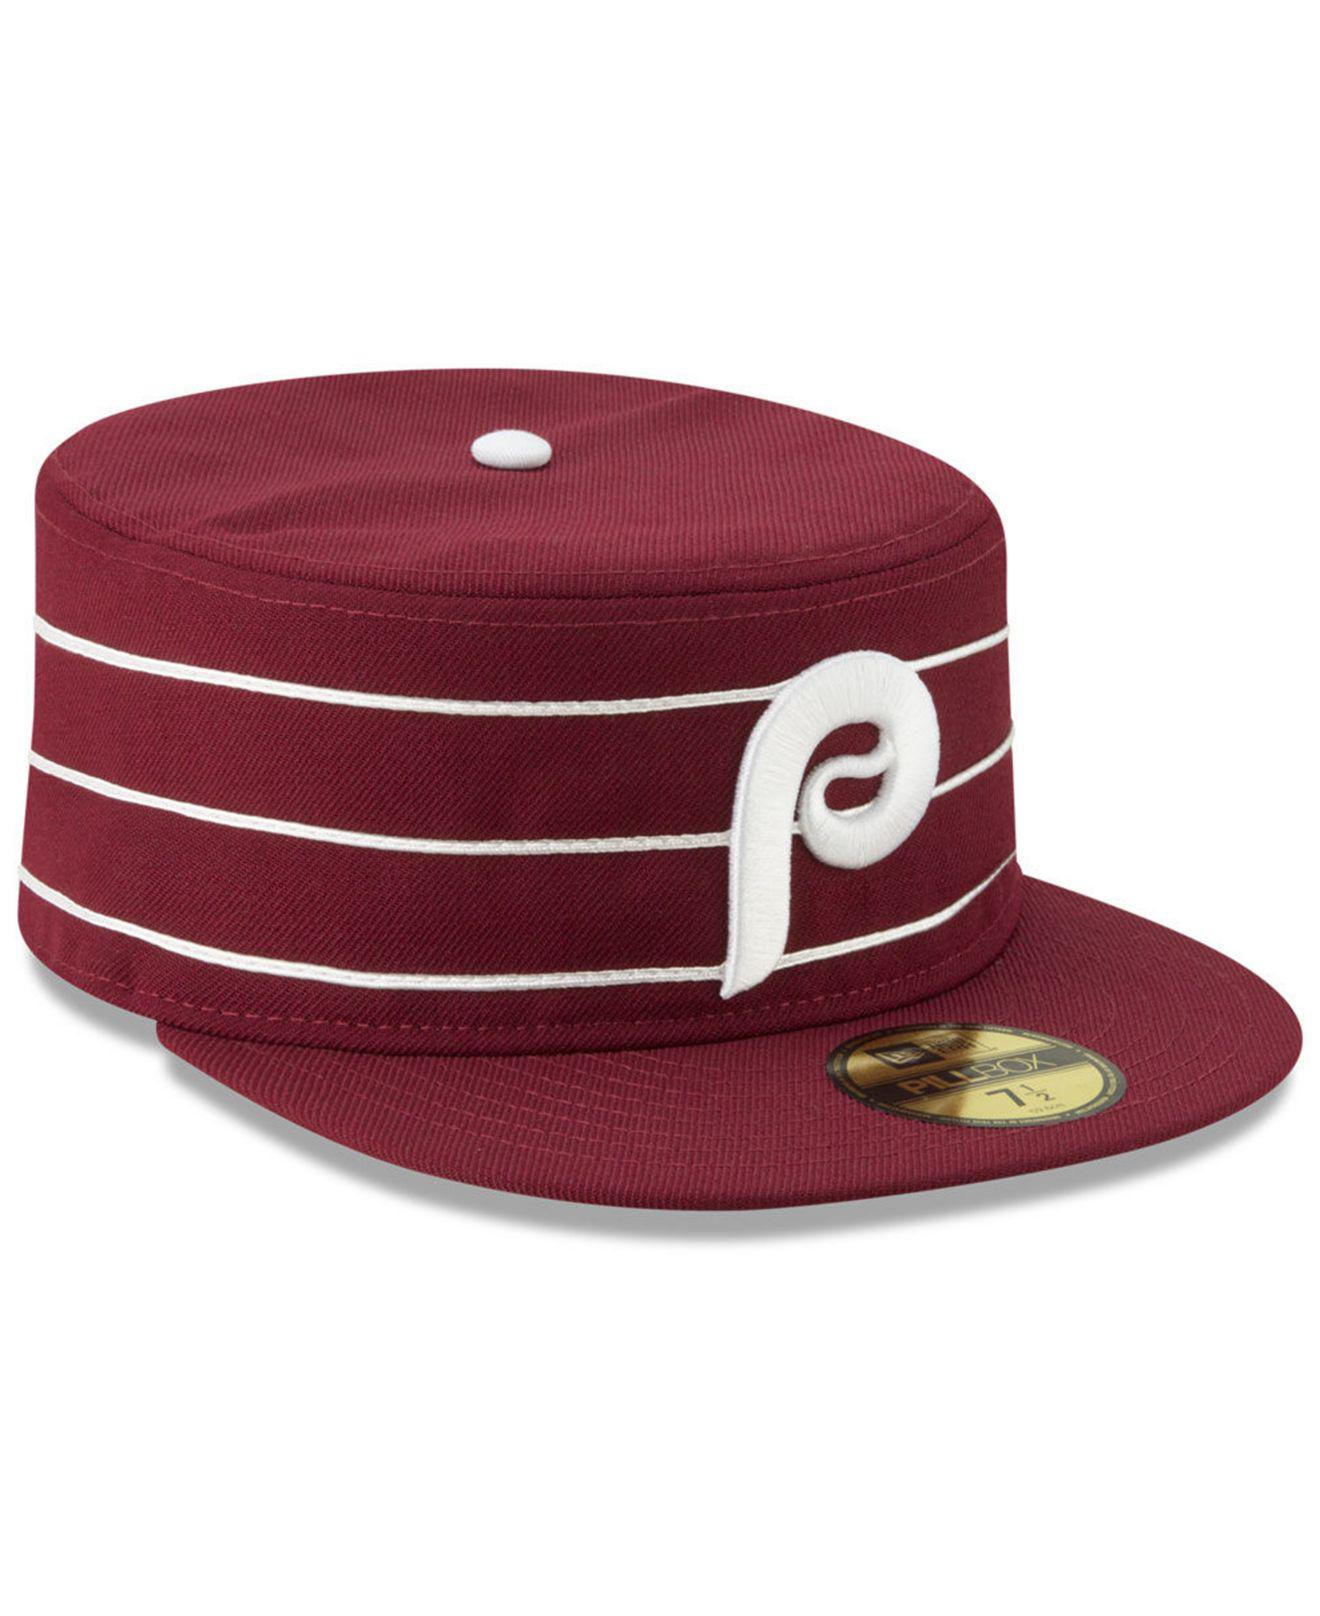 a9dc2e98464f83 ... ebay philadelphia phillies pillbox 59fifty fitted cap for men lyst.  view fullscreen 8311f fb6ae ...